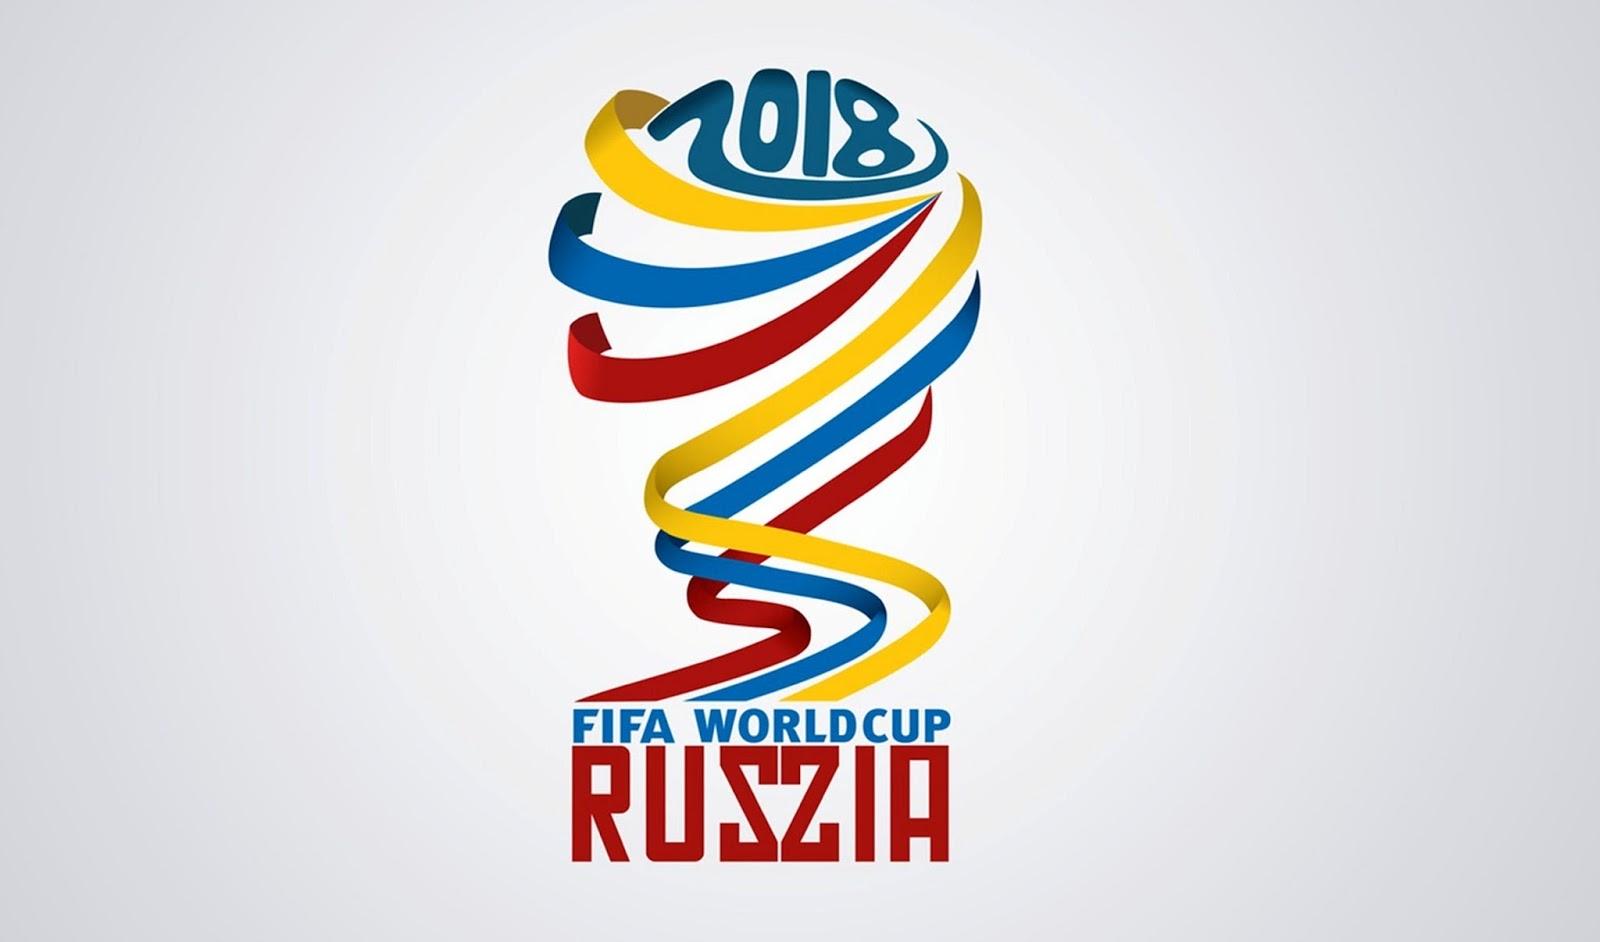 FIFA WORLD CUP 2018 C